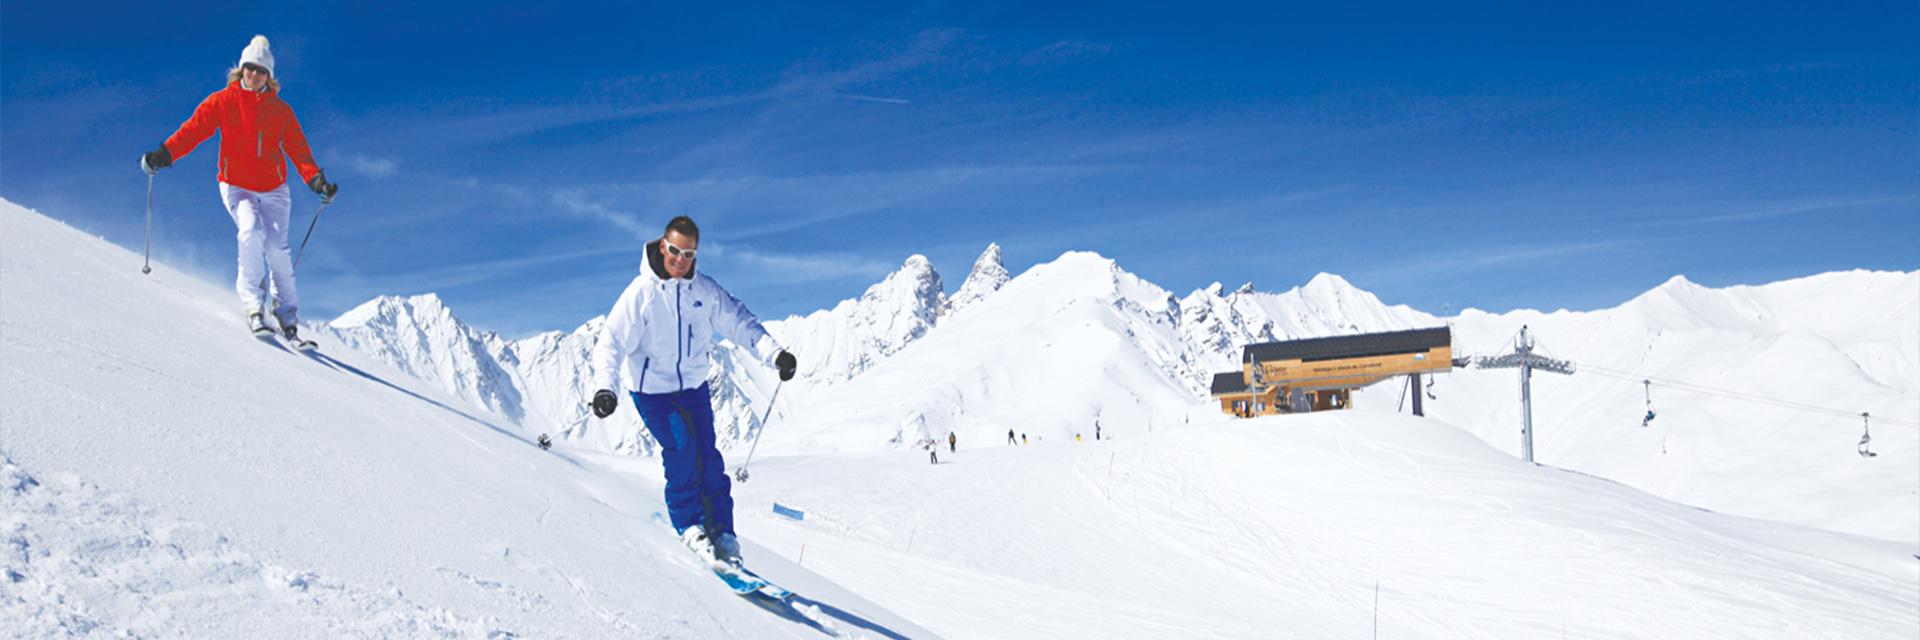 Village_club_vacances_savoi-vanoise-la-pulka-ski-montagne